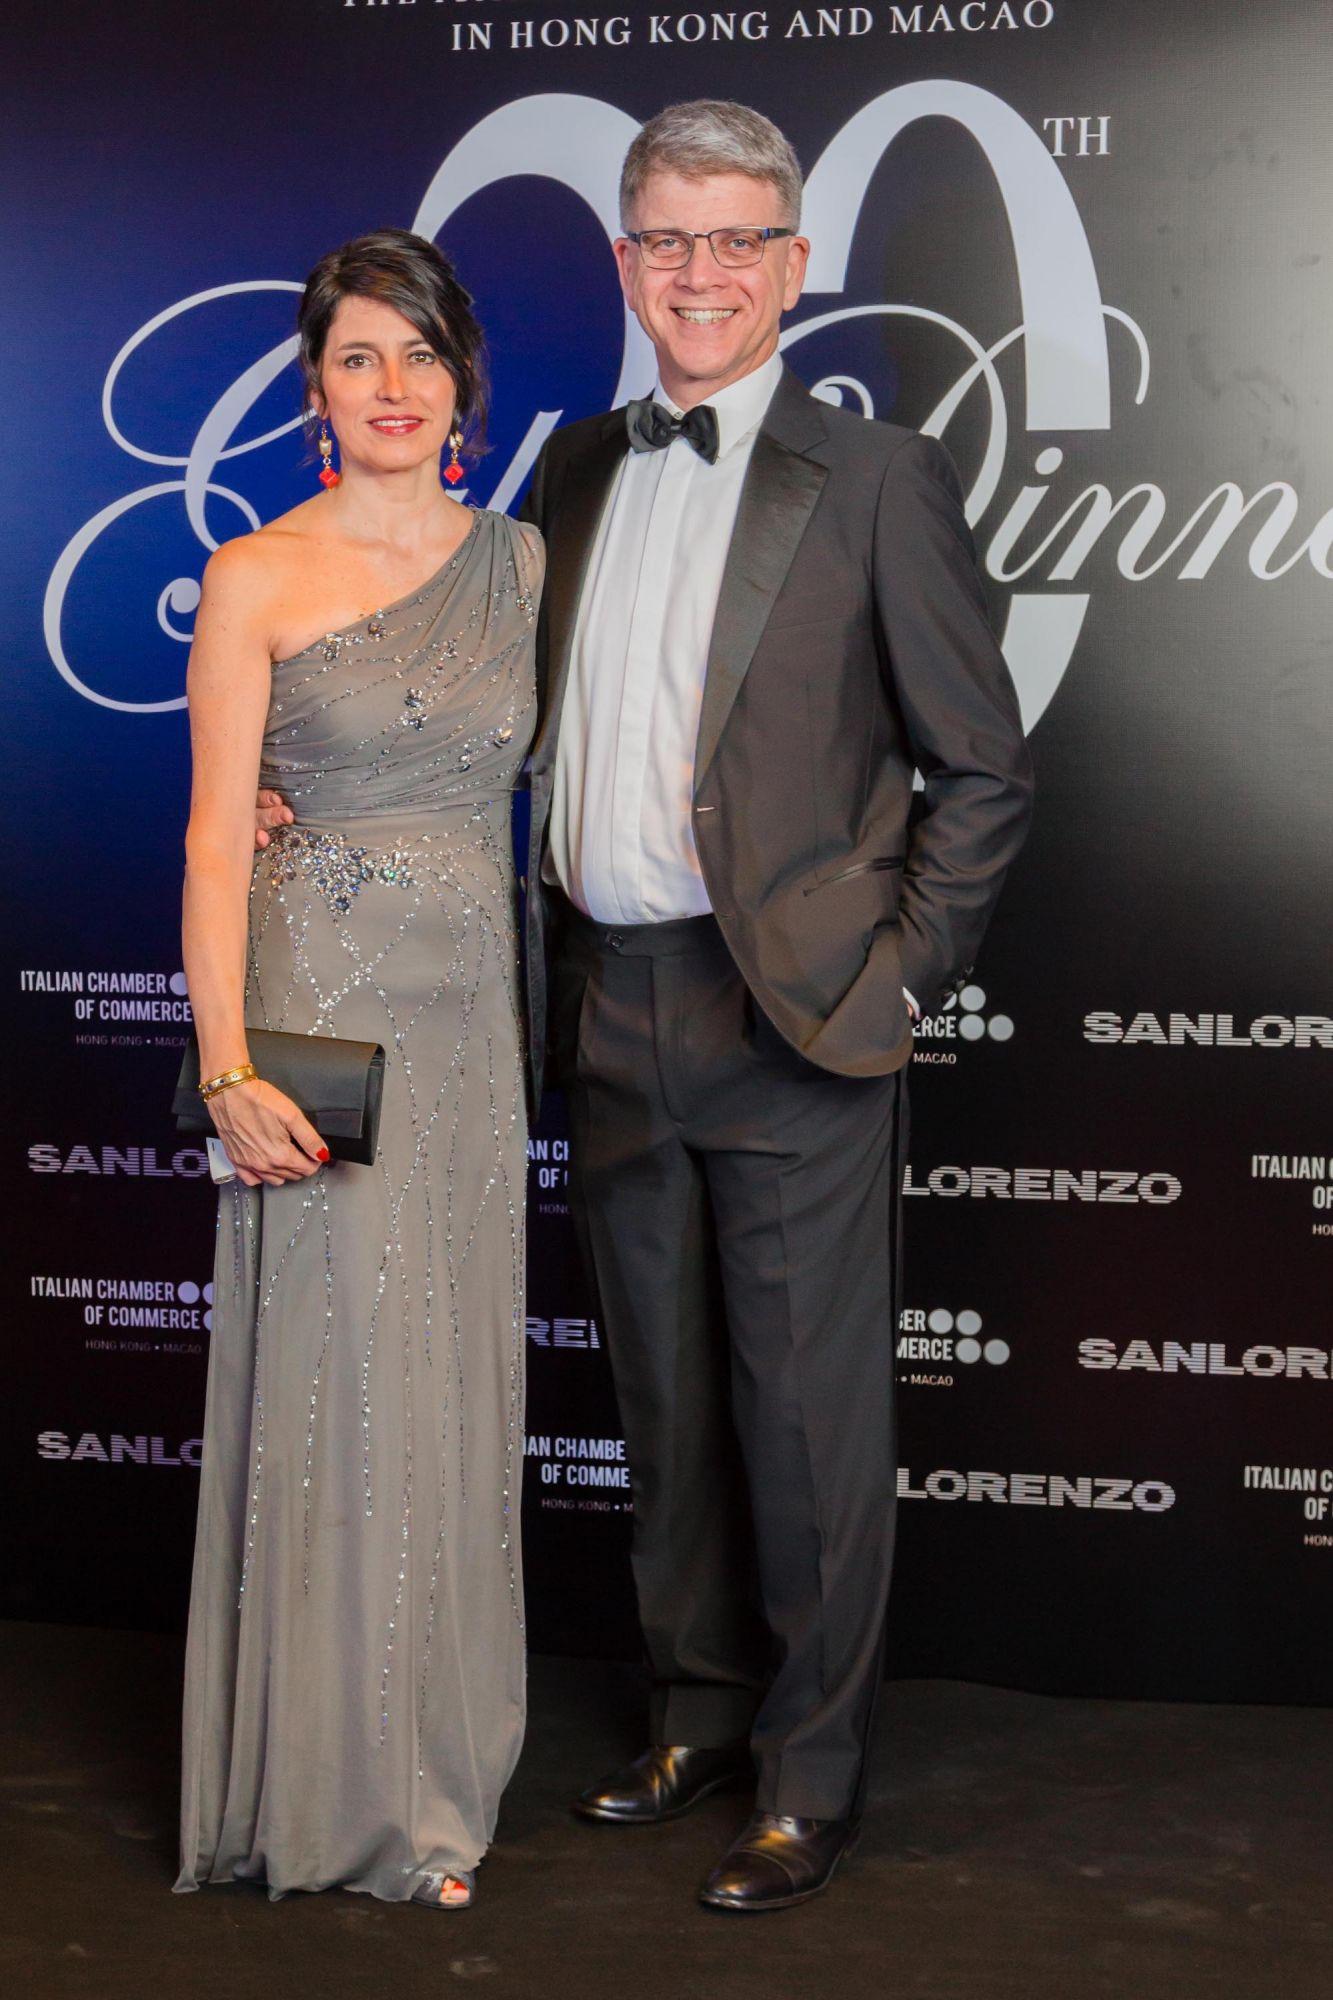 Paola De Antonellis and Luca Cico